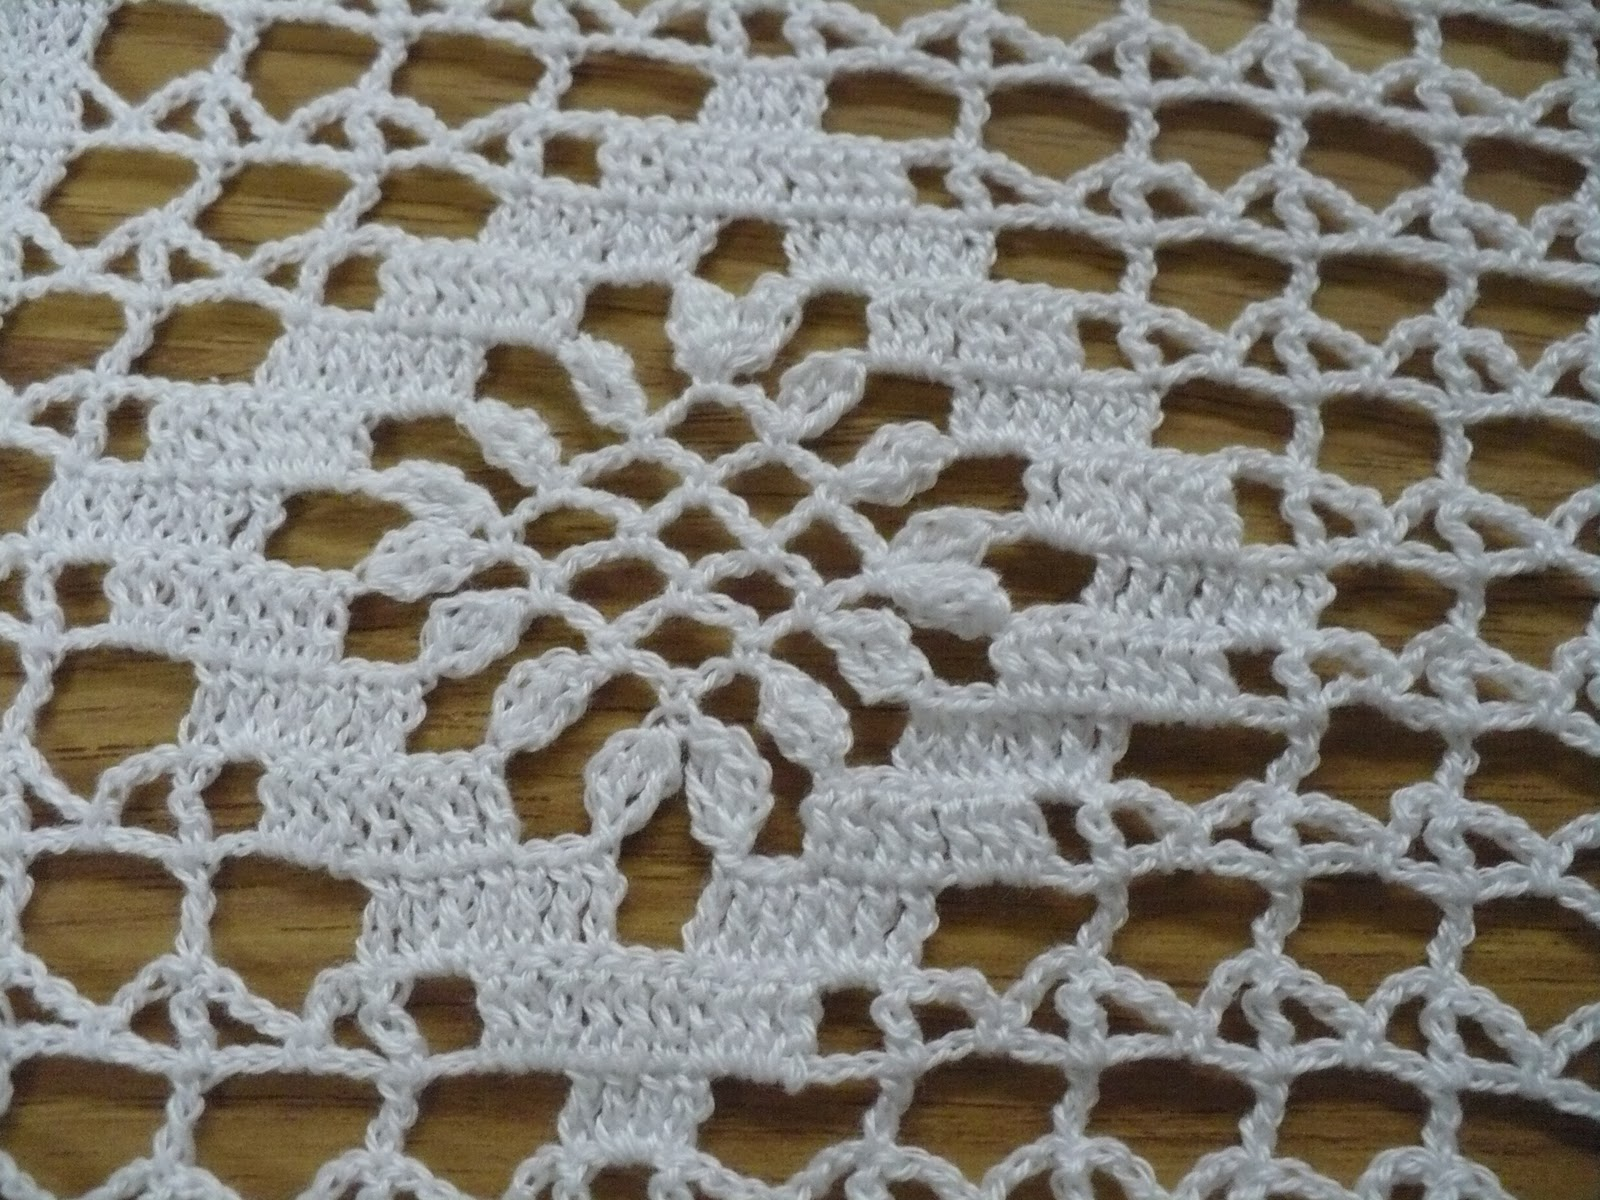 Caminos De Mesa Tejidos A Crochet. Camino De Mesa Tejido A Crochet ...